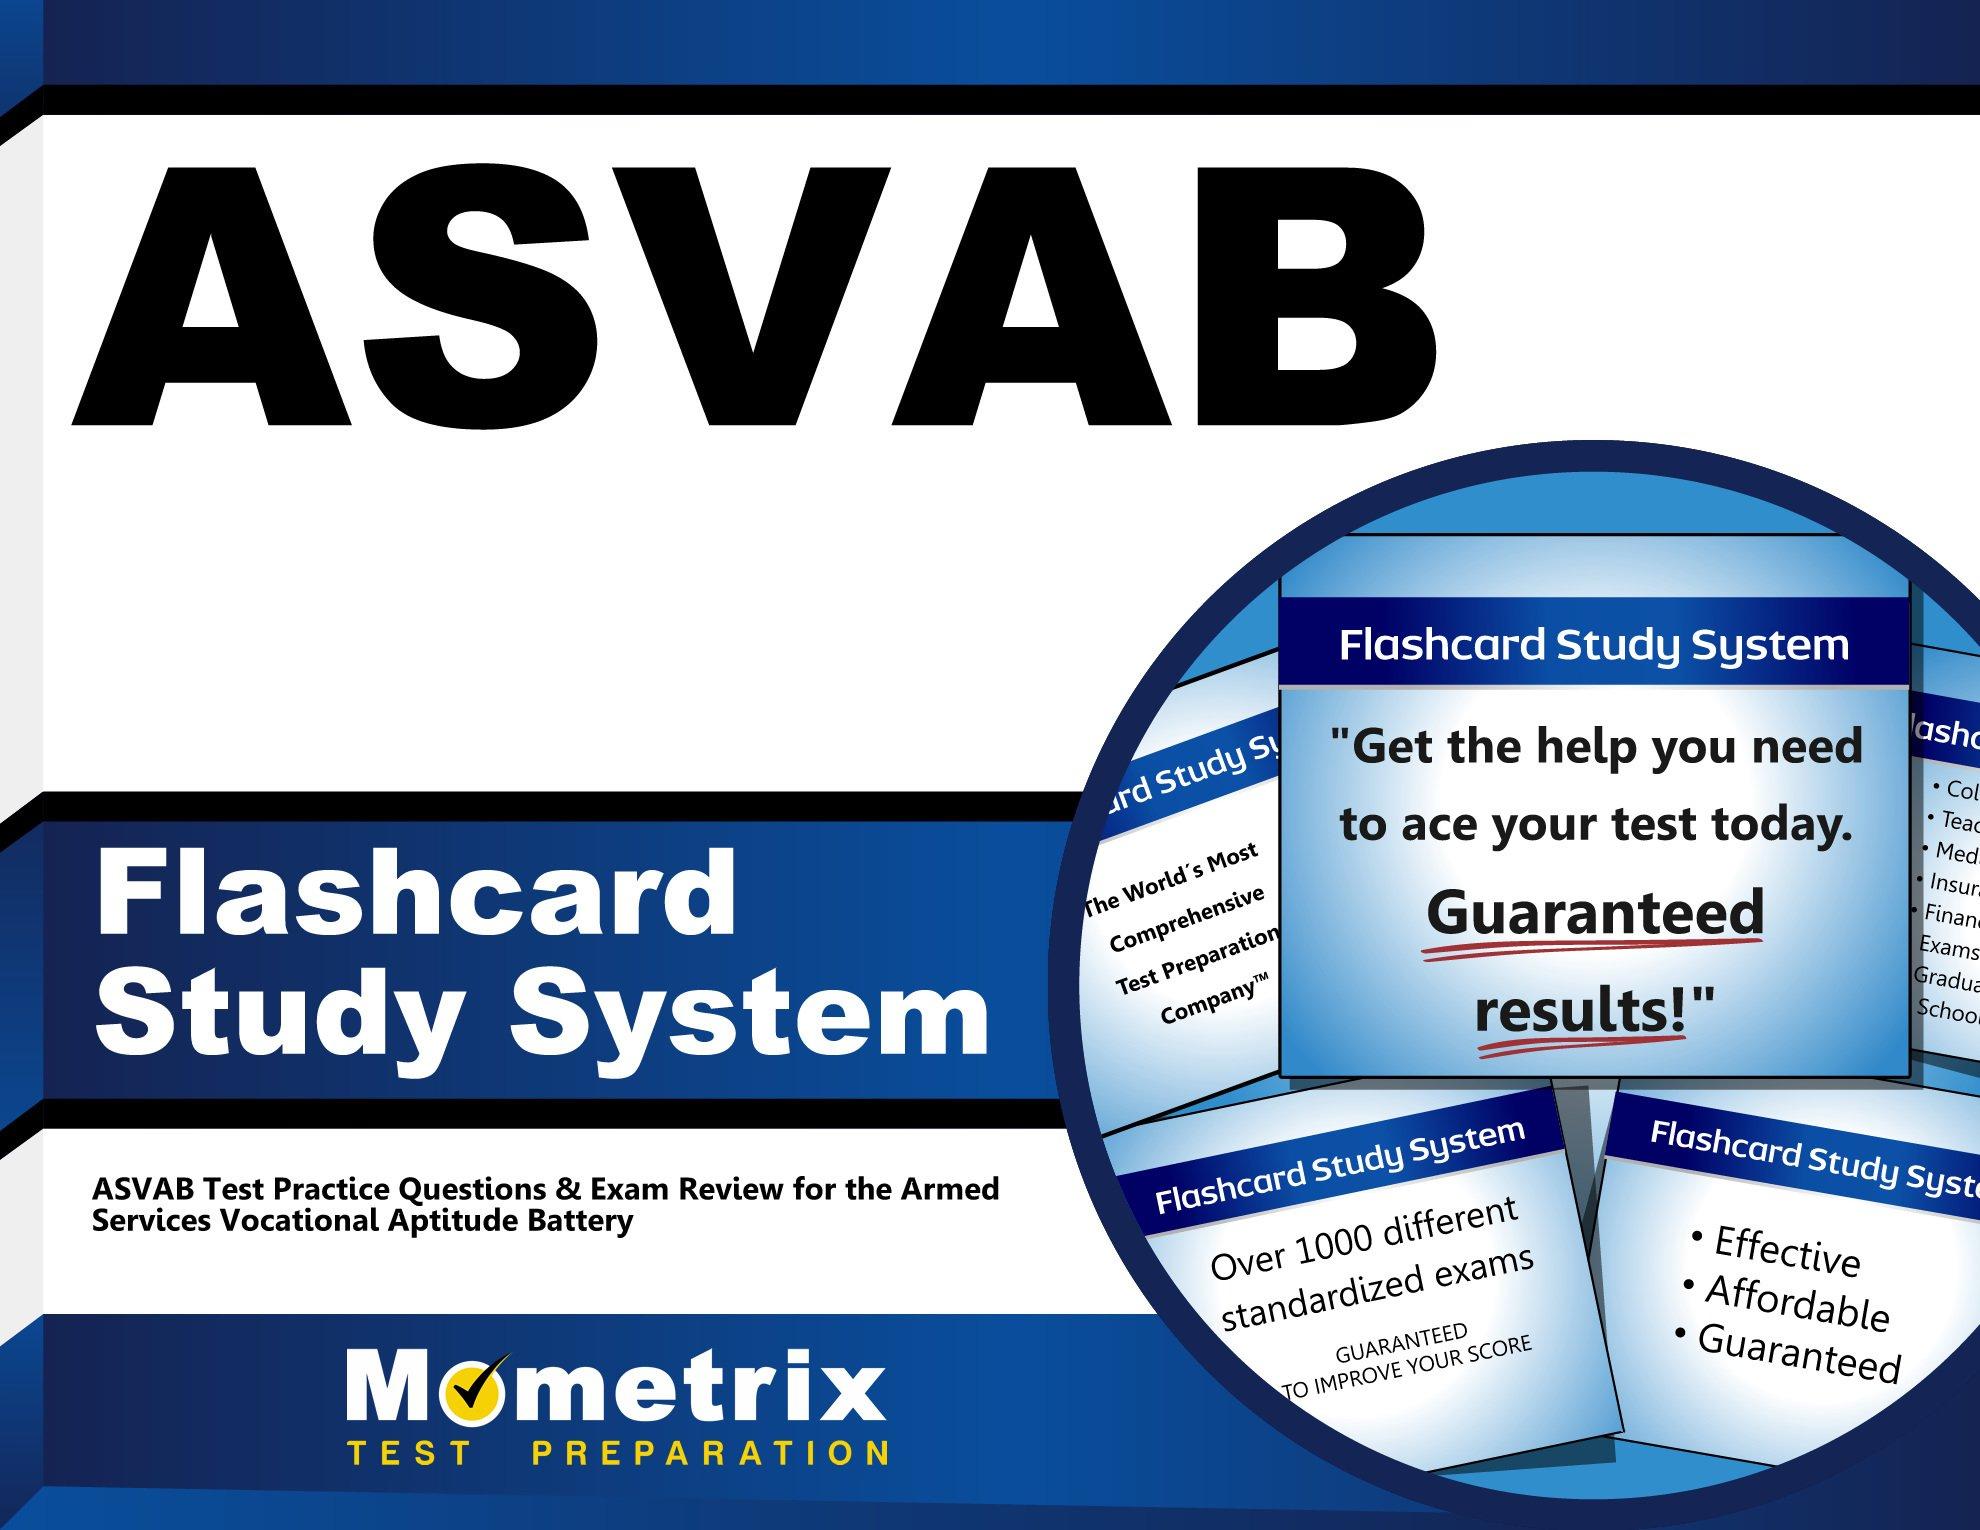 ASVAB Flashcard Study System Vocational product image